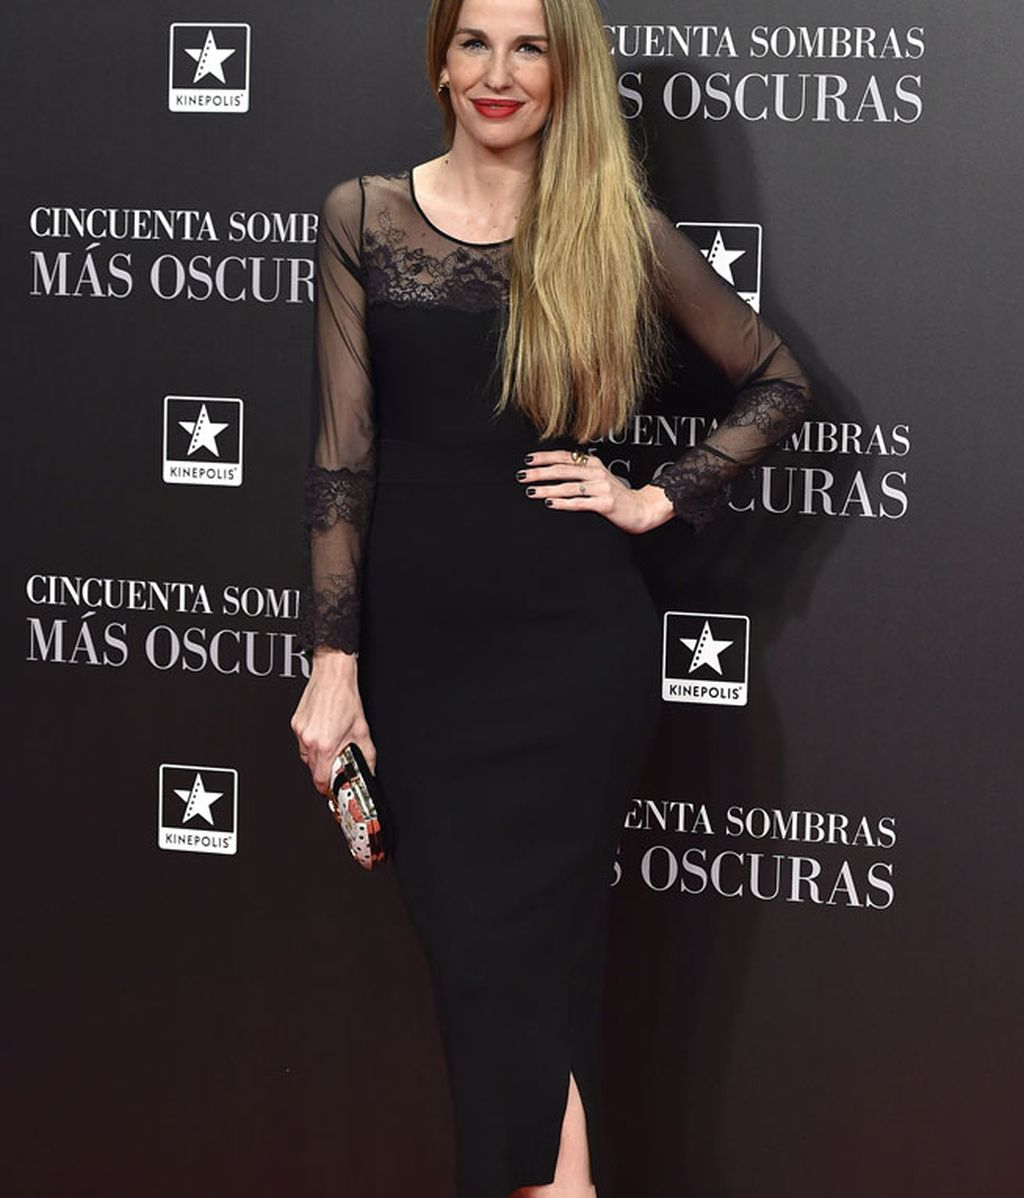 Carola Baleztena eligió un vestido negro con transparencias